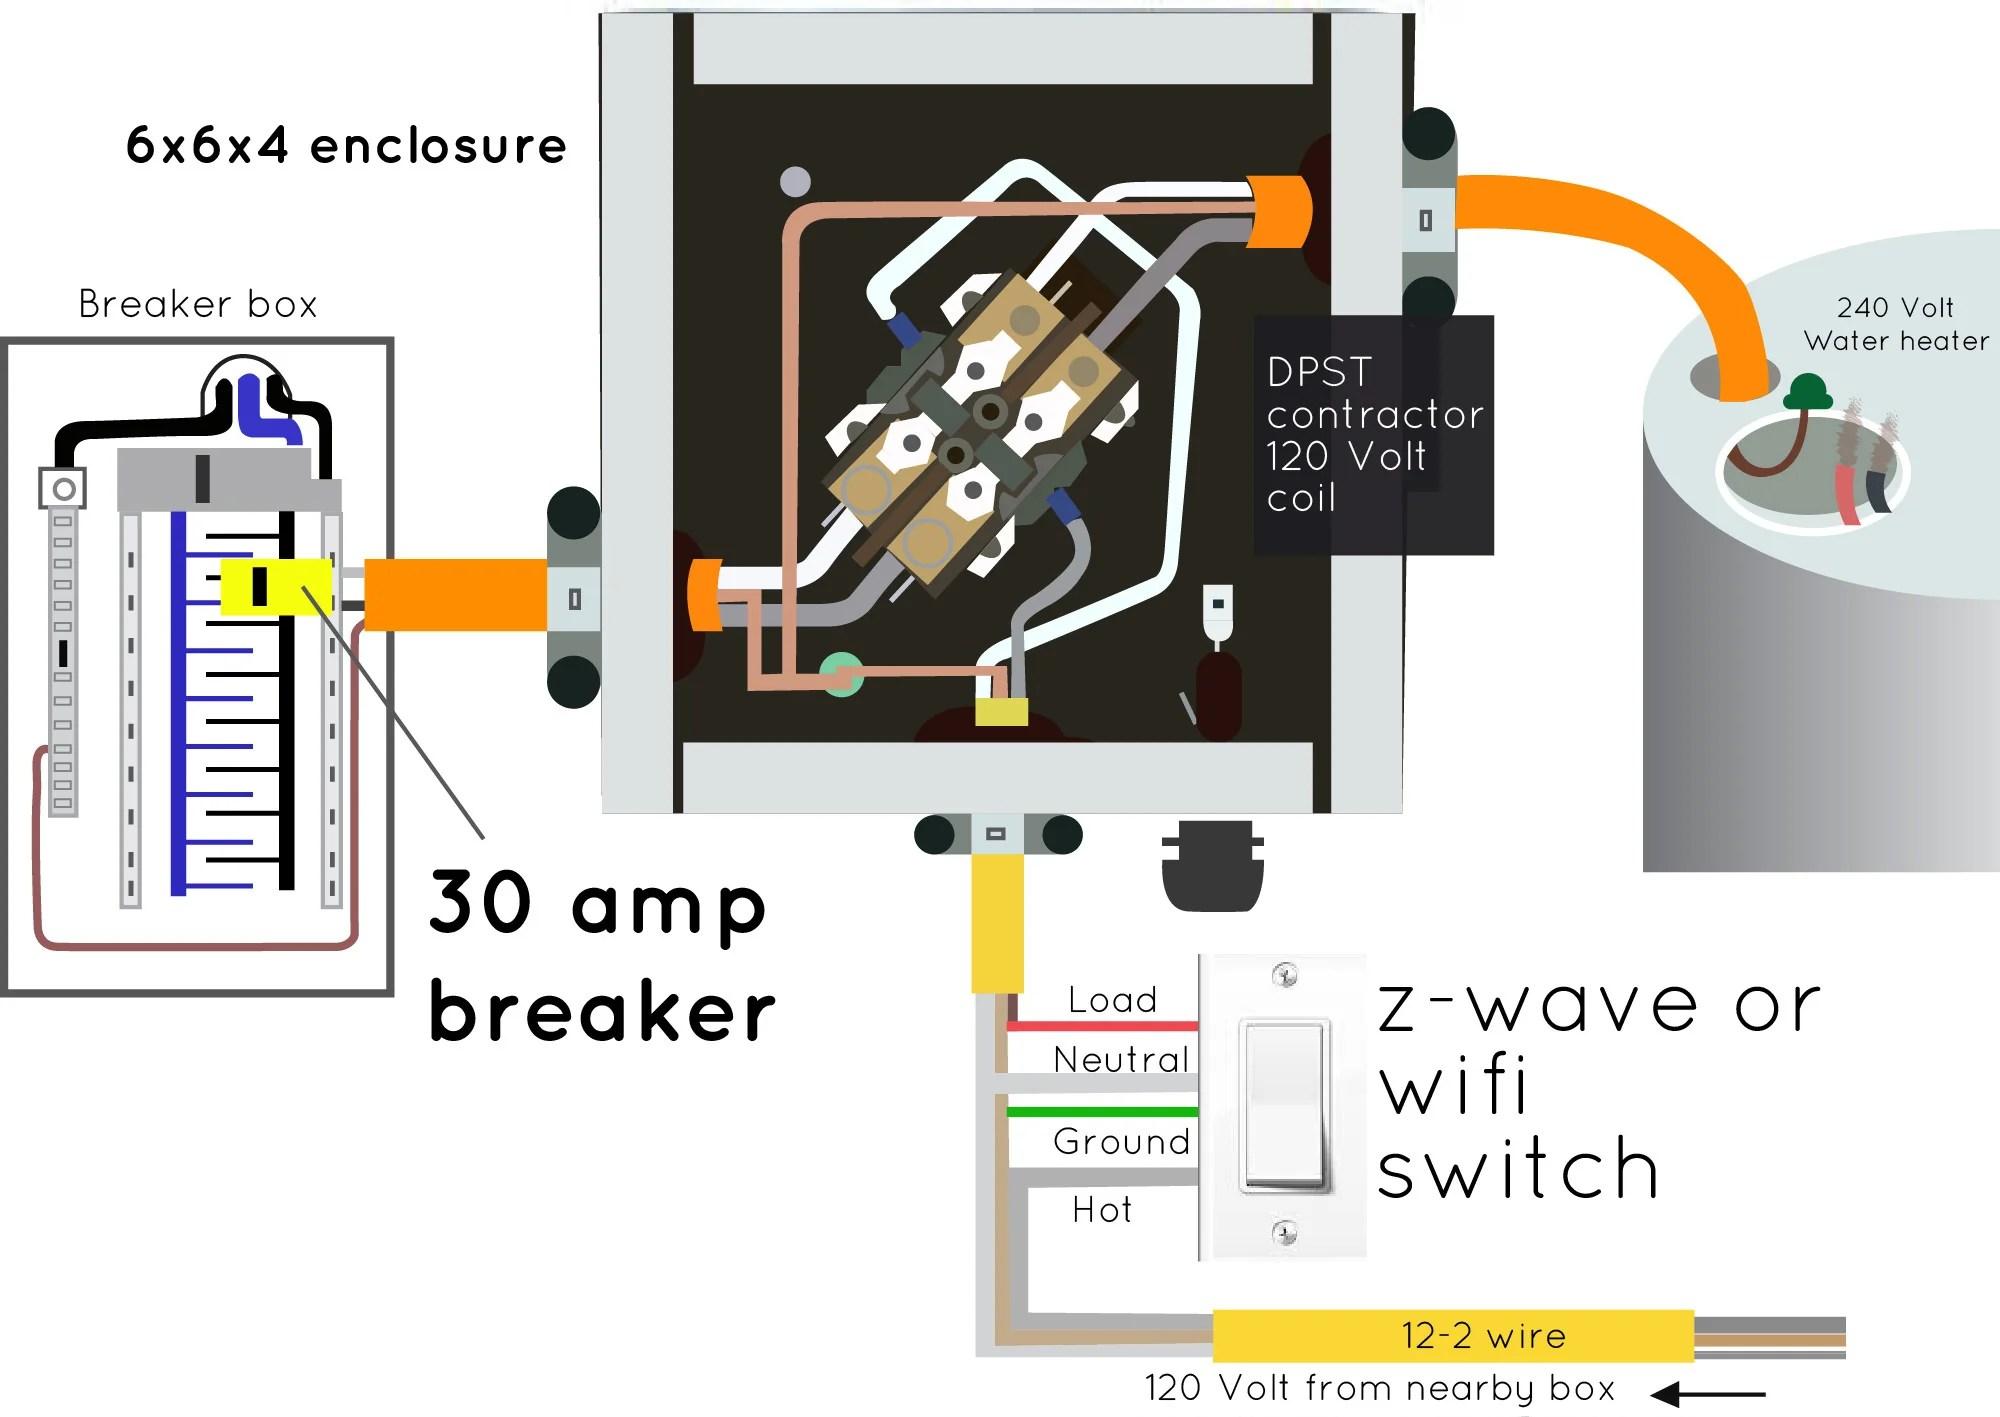 medium resolution of 120 volt contactor wiring wiring diagram tutorial 240 vac contactor wiring